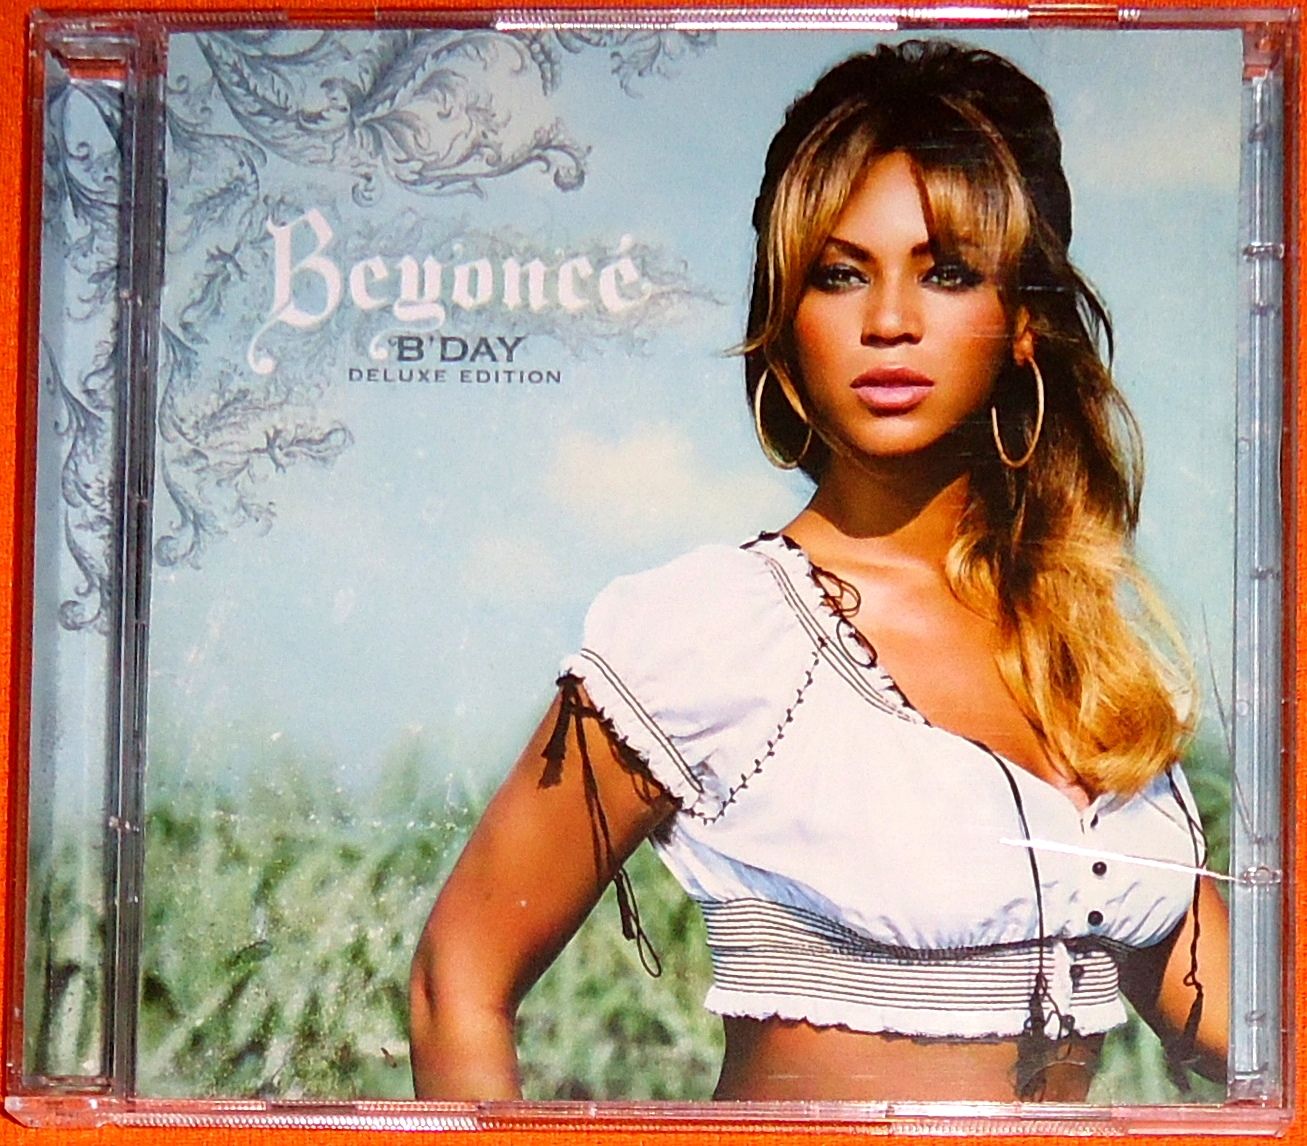 Beyoncé Deluxe Beyoncé: My Collection: Beyoncé » B'Day (Deluxe Edition) (CD+DVD